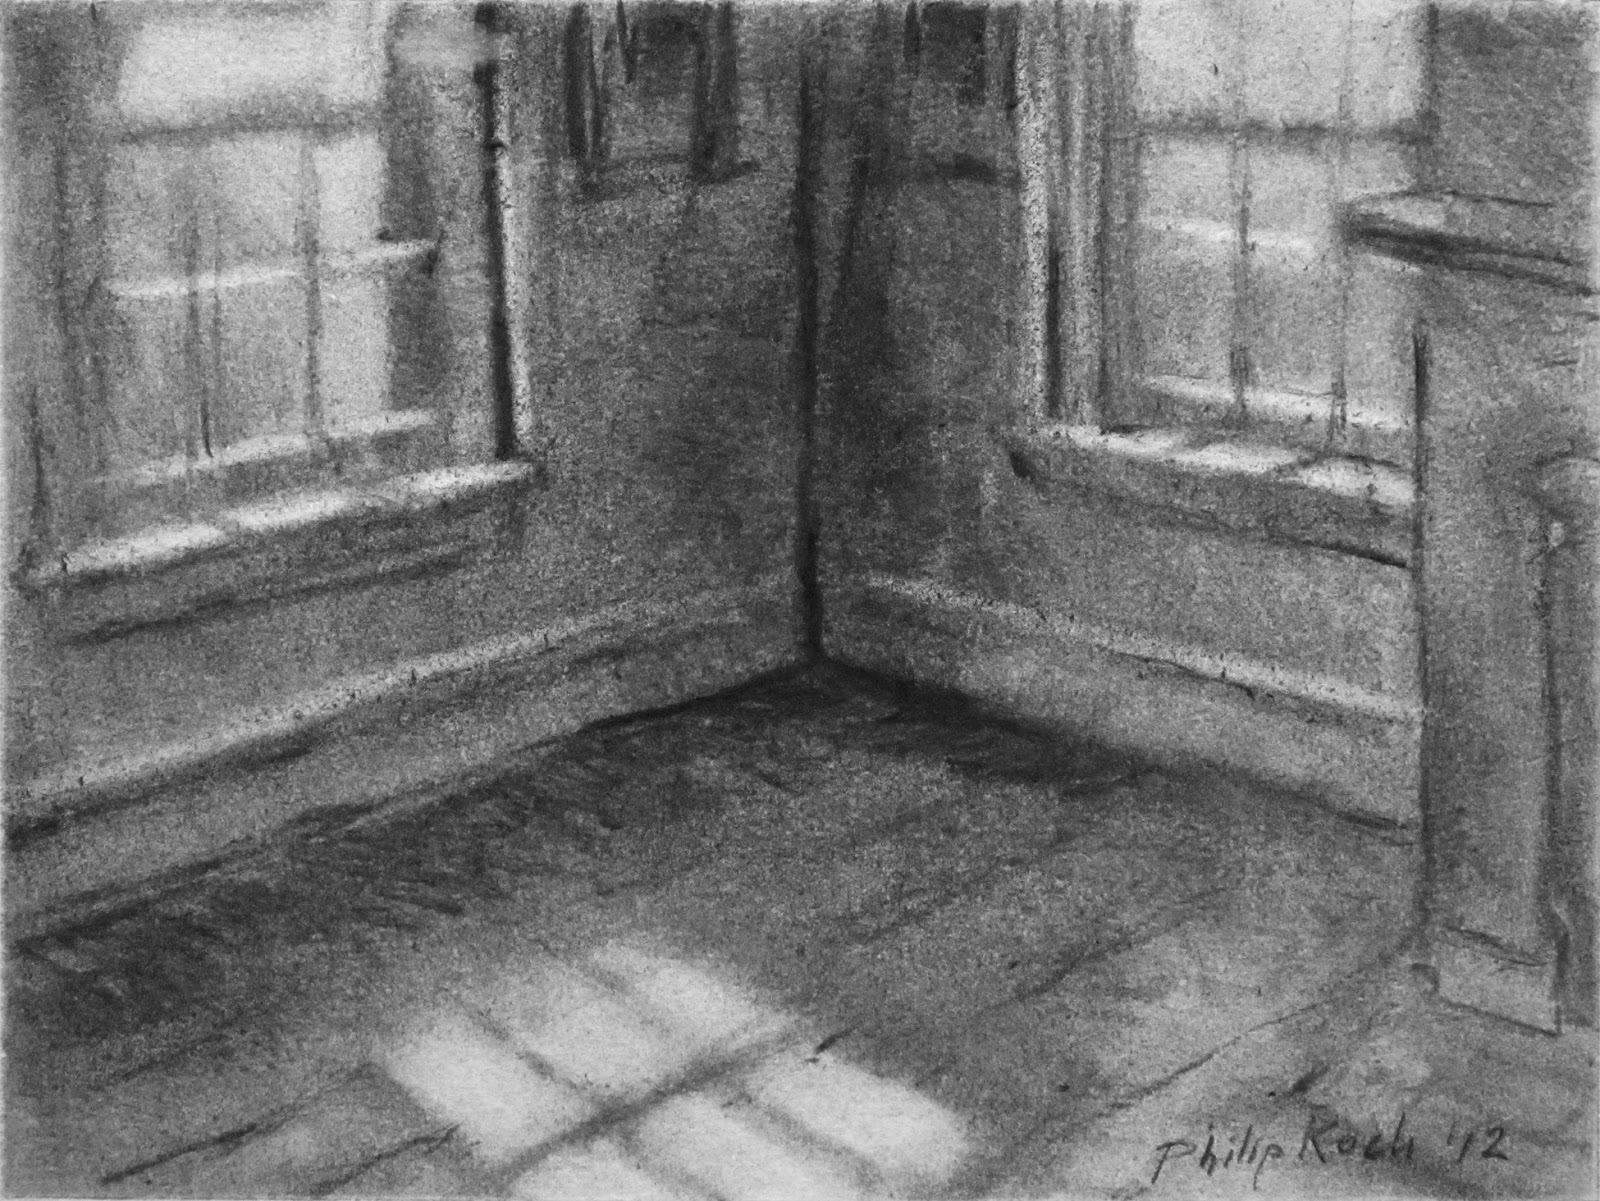 Dark empty room with window - Empty Room Creepy Displaying 15 Images For Big Empty Room Creepy